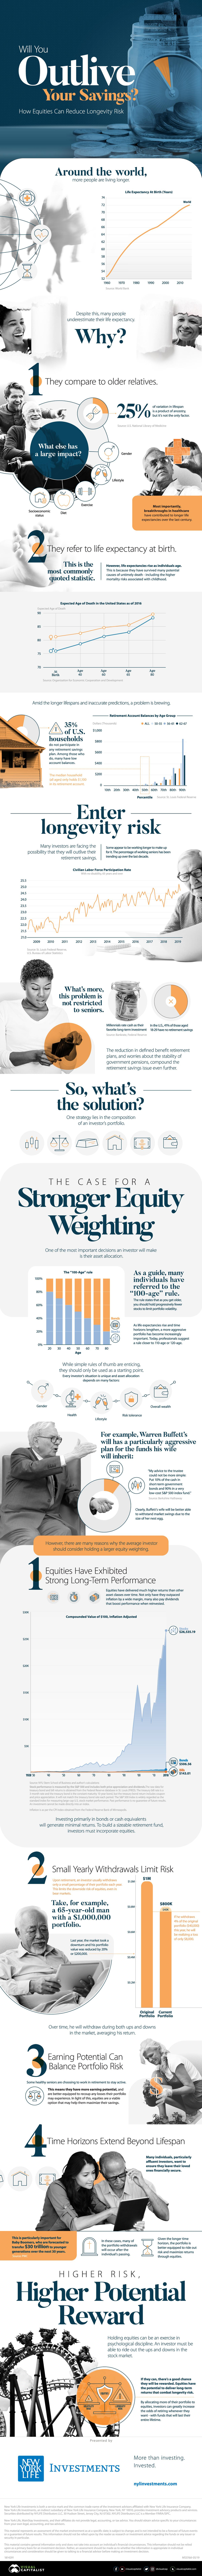 Equities Can Reduce Longevity Risk IG